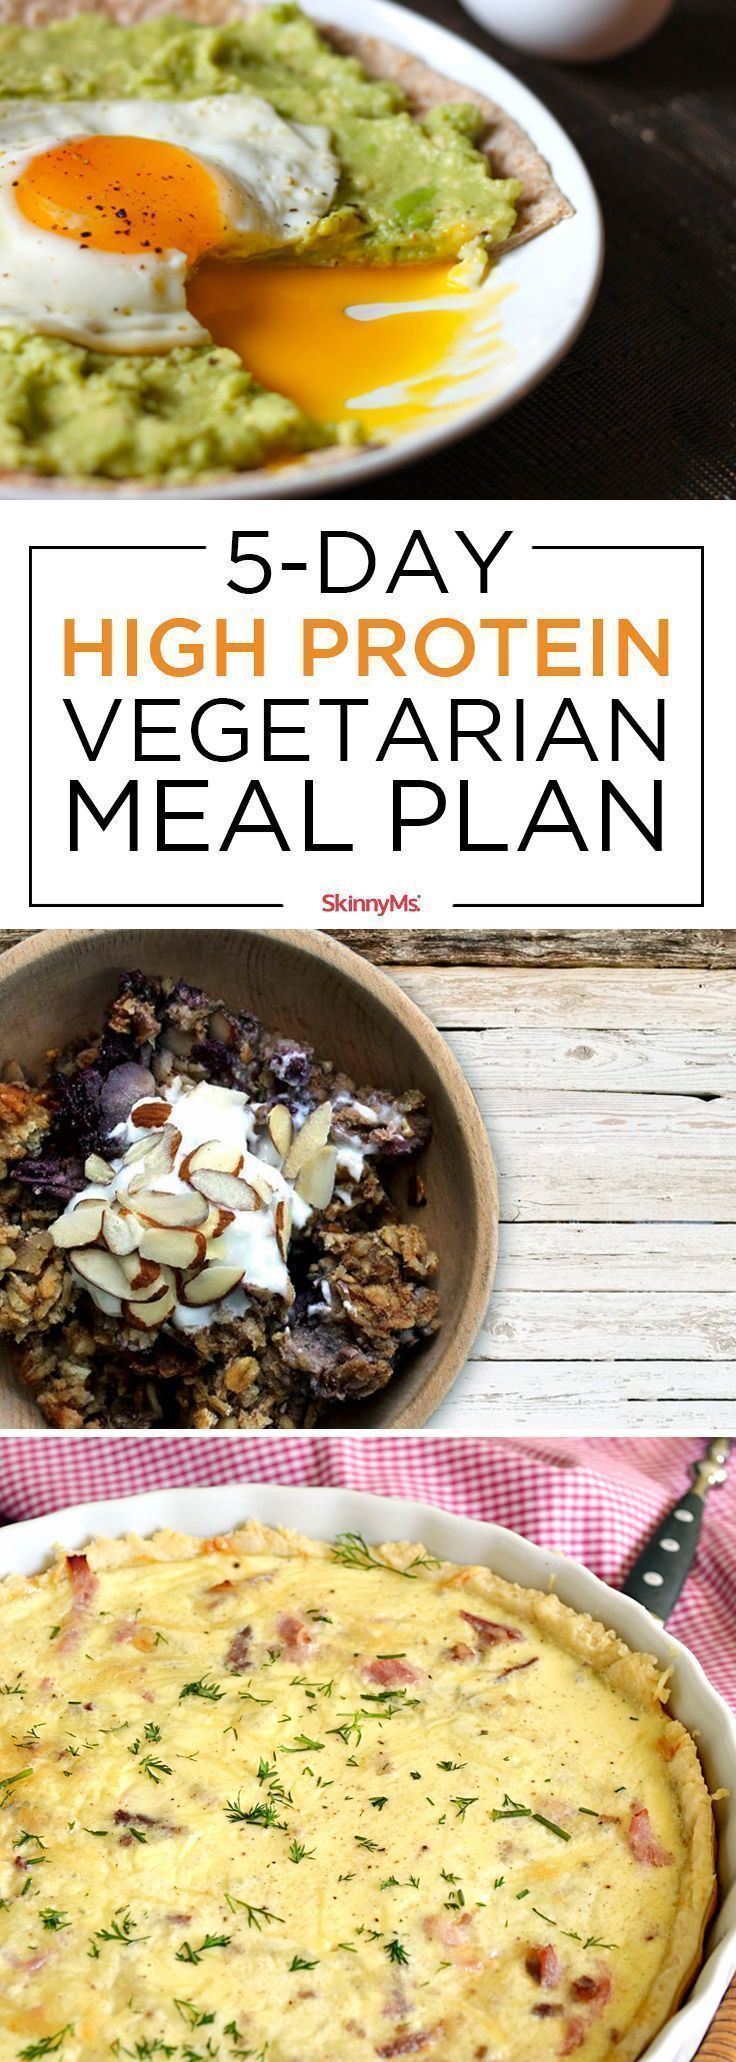 High Protein Vegetarian Meals  Best 25 High protein ve arian foods ideas on Pinterest